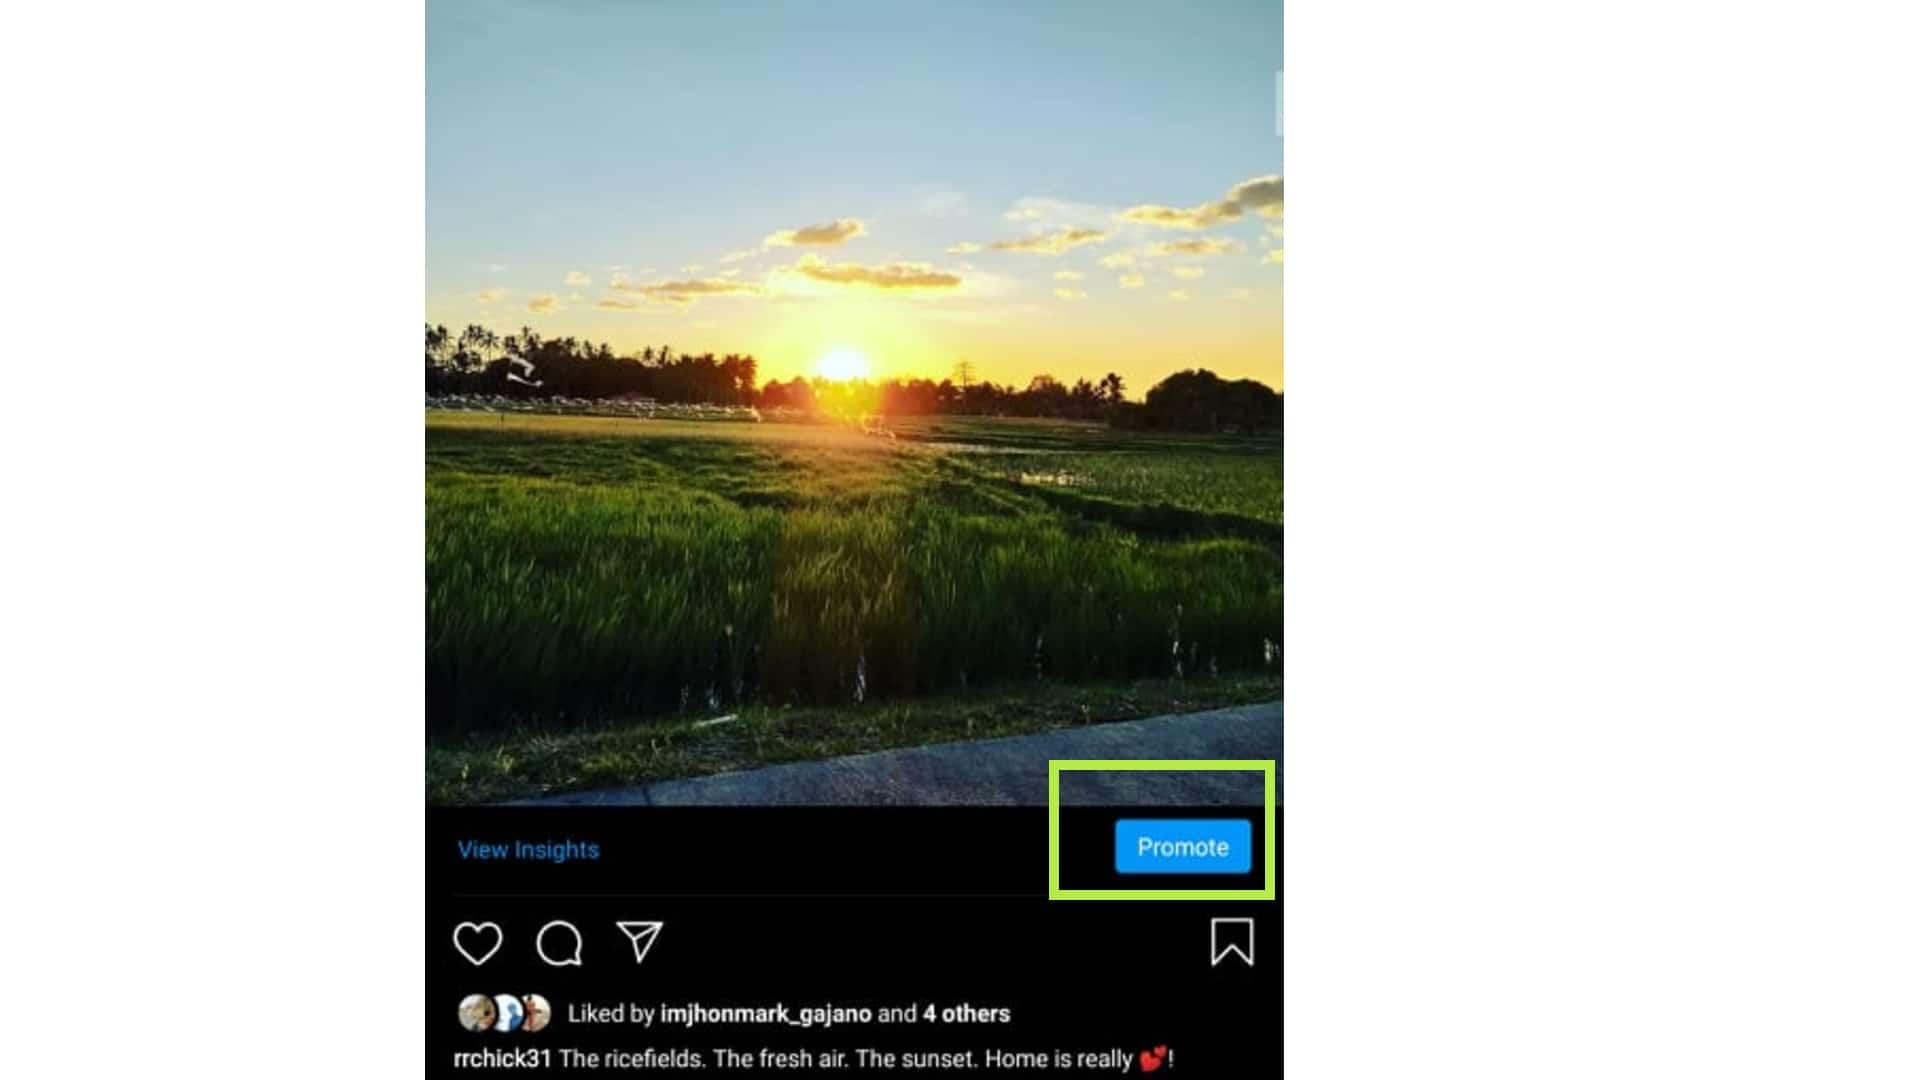 instagram promote post